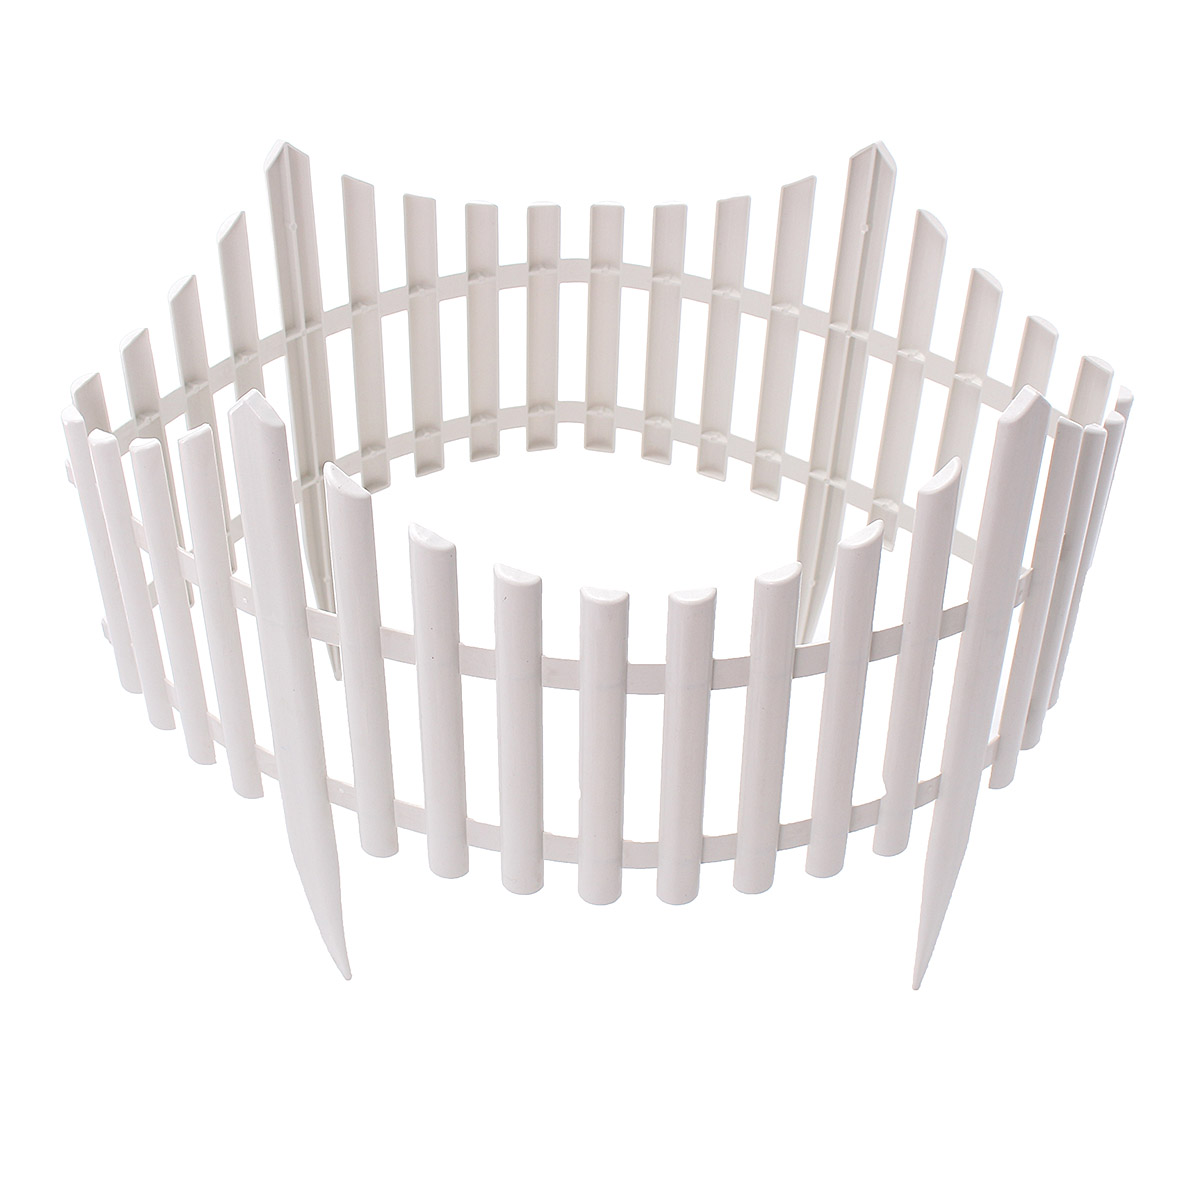 12Pcs 610x330mm Plastic Garden Border Fencing Fence Pannels Outdoor Landscape Decor Edging Yard Easy Install Insert Ground Type